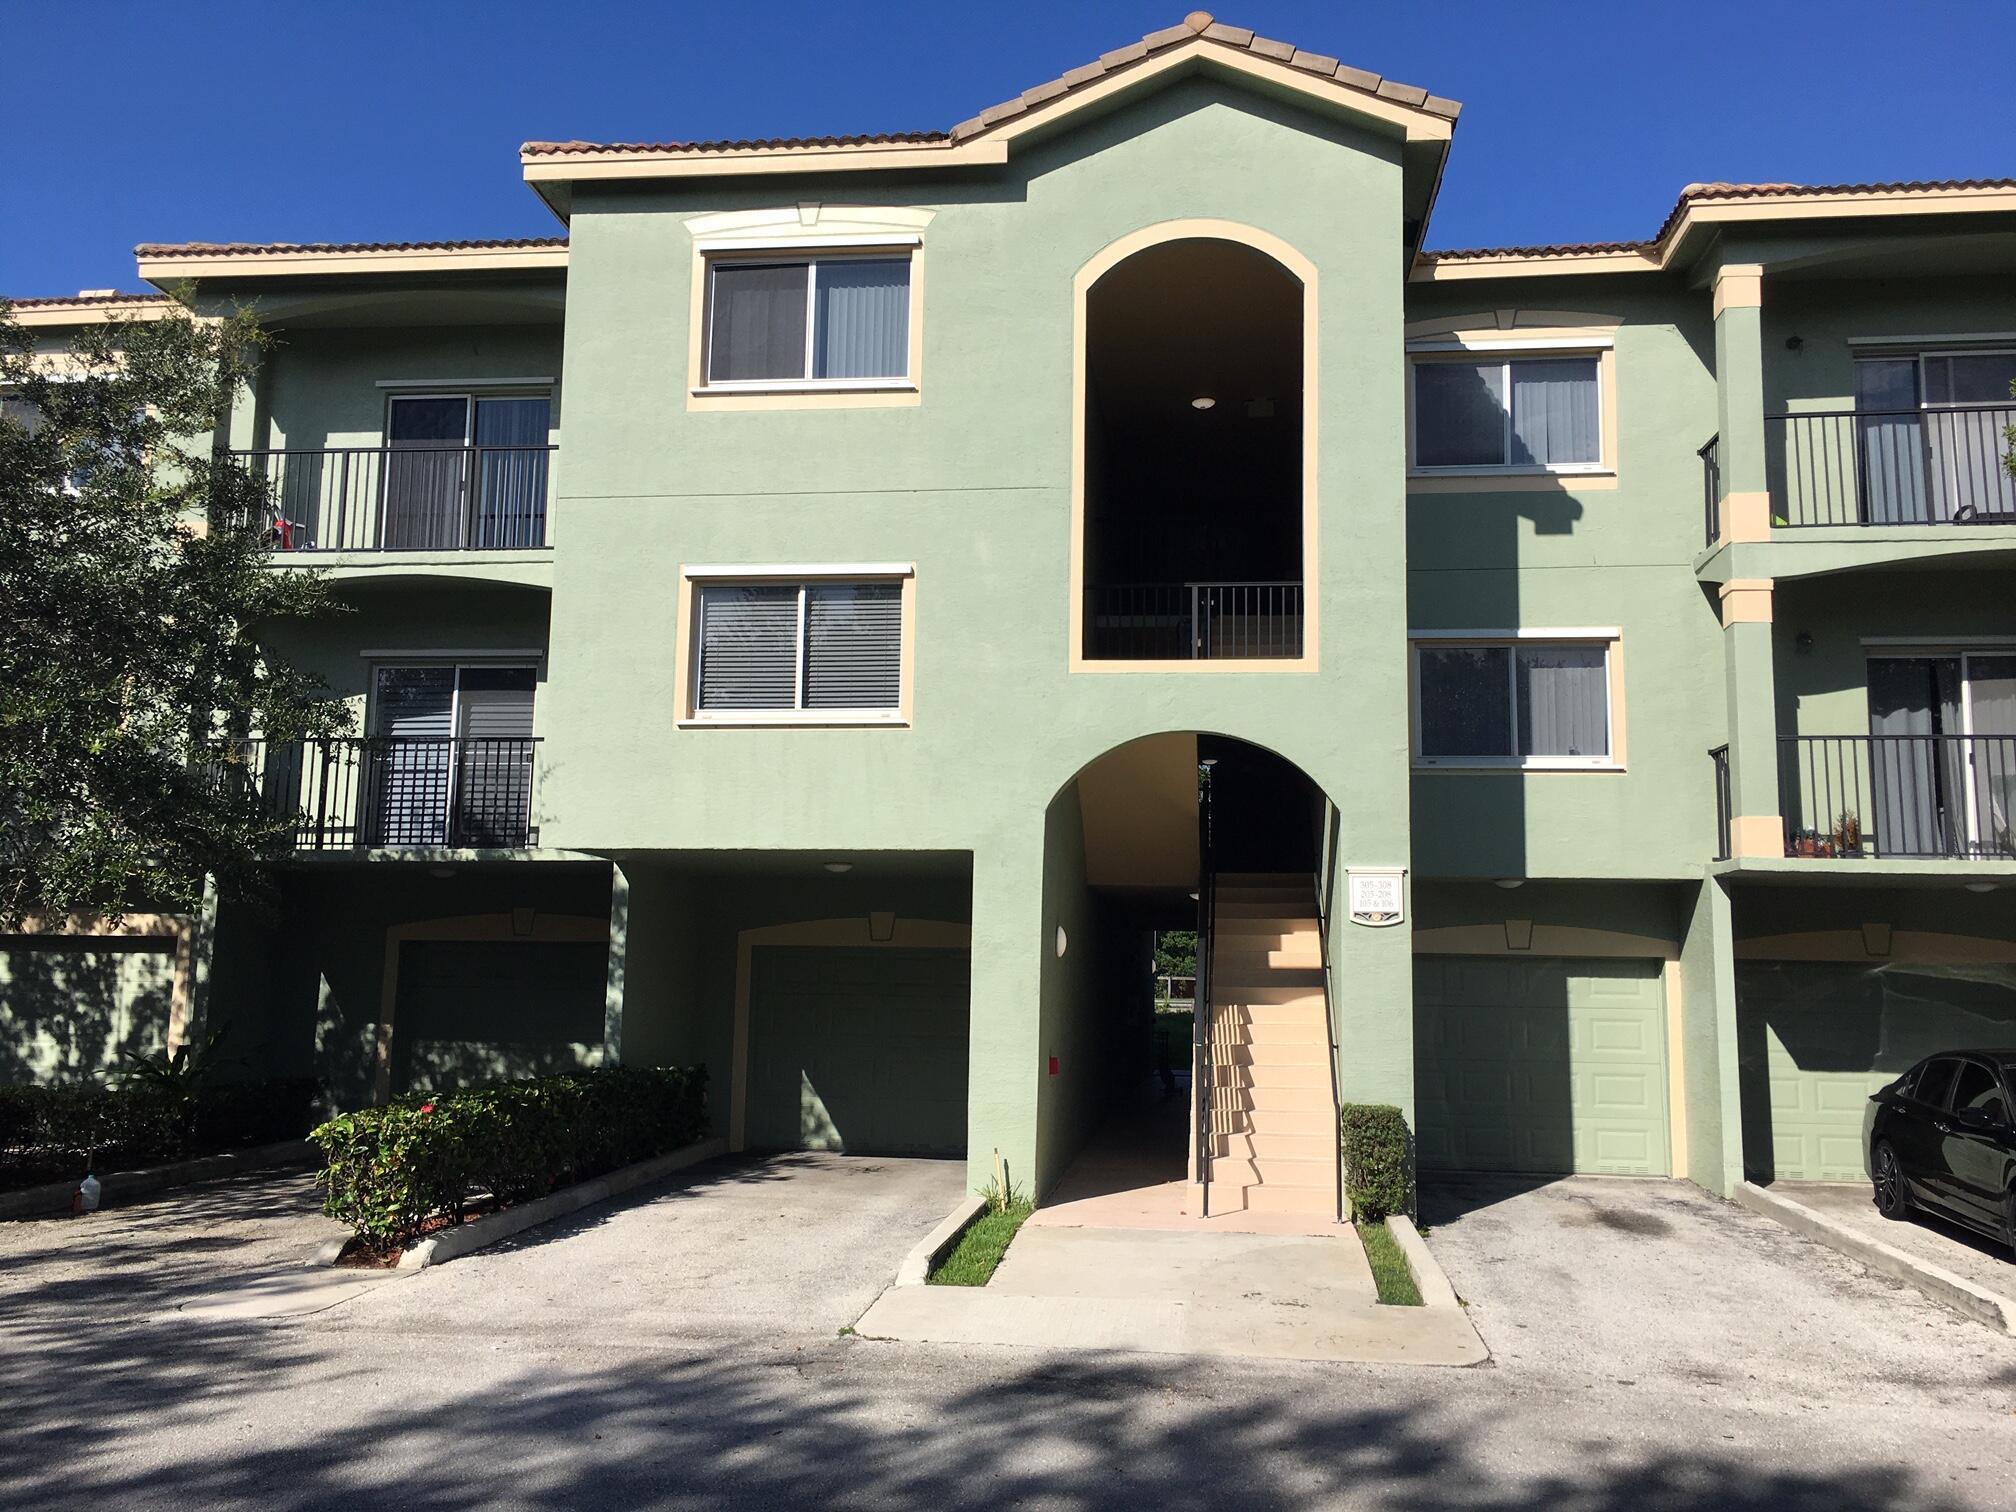 Home for sale in Kensington Royal Palm Beach Florida